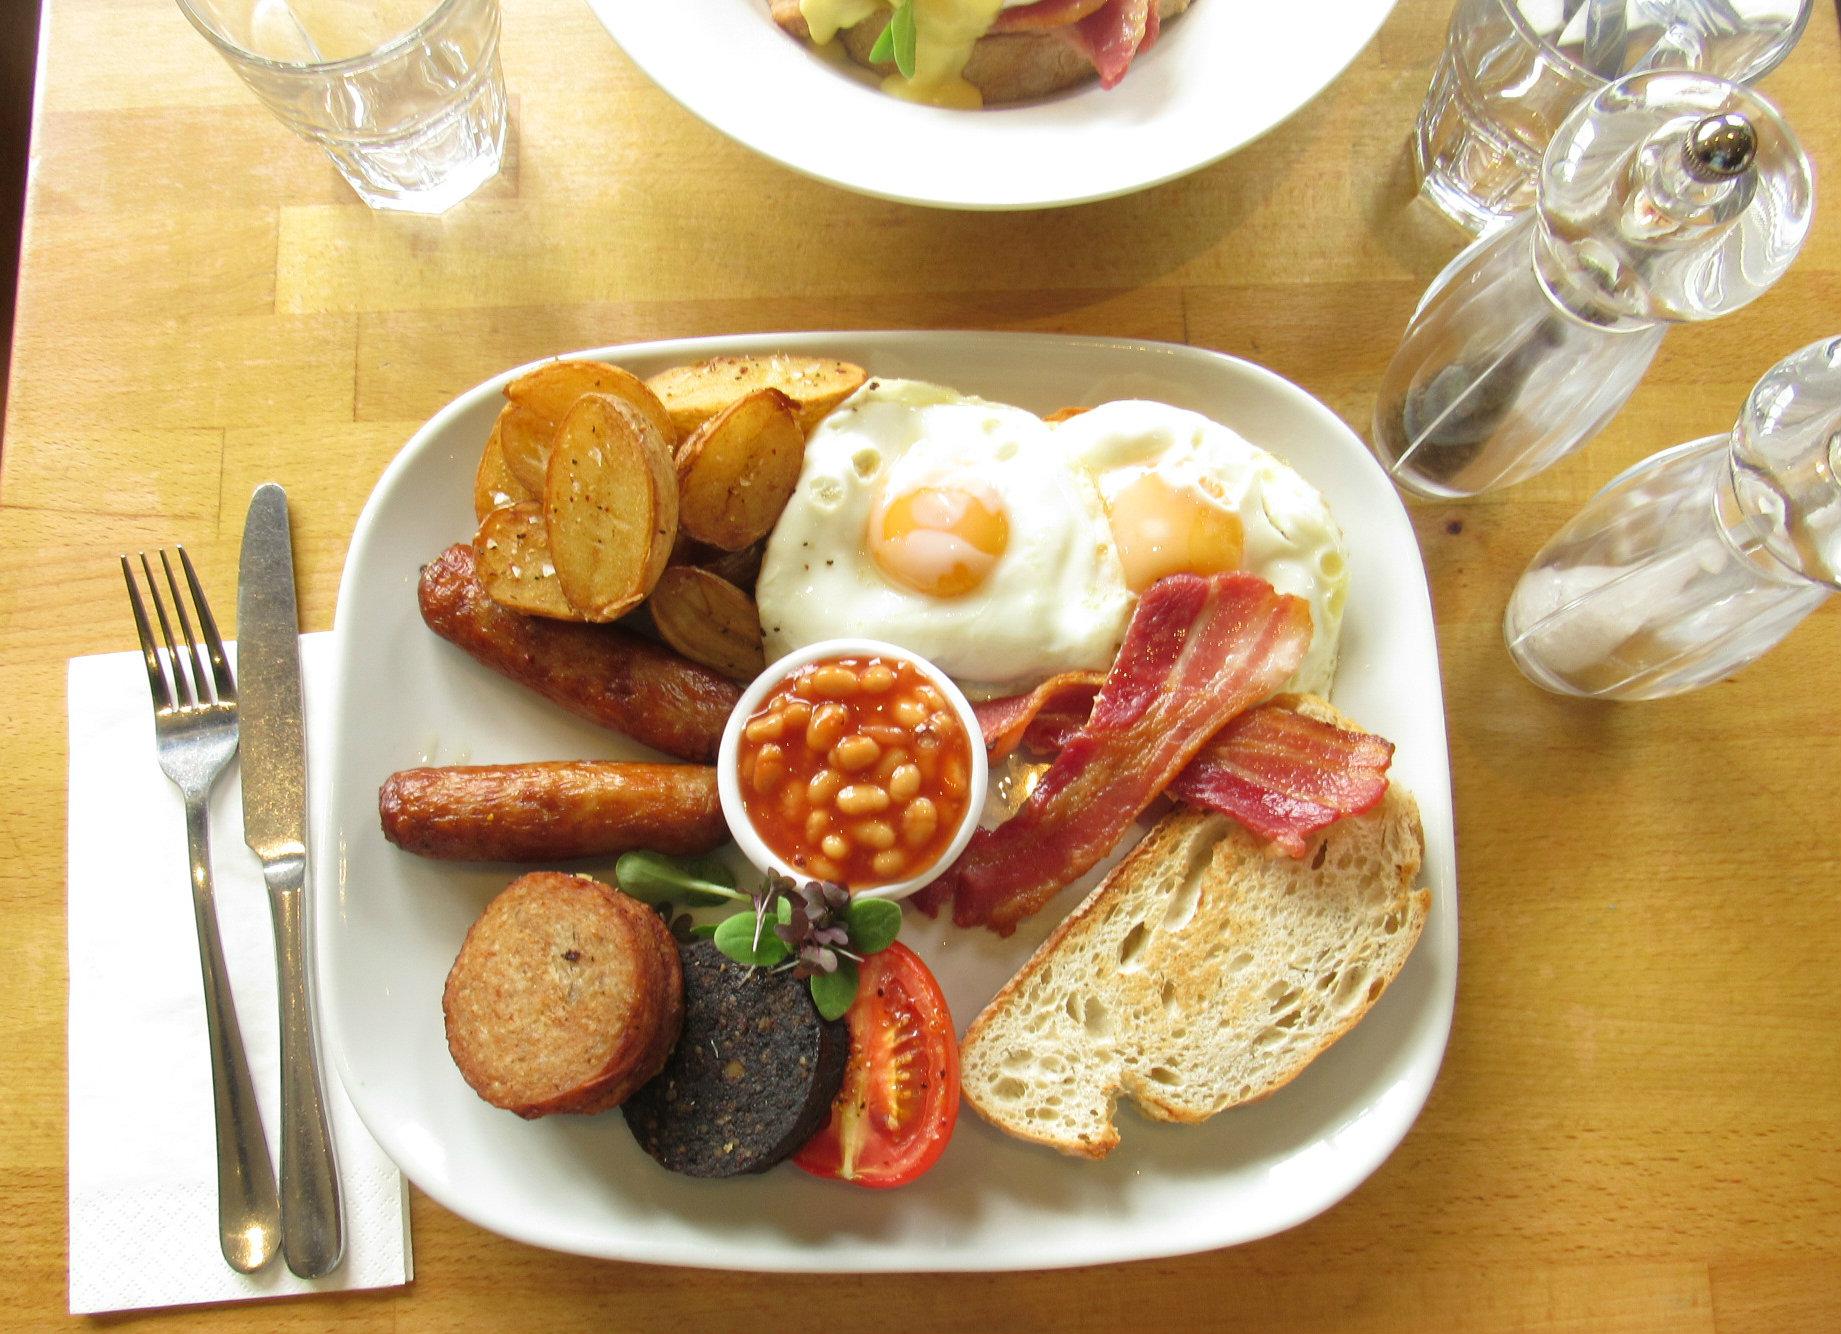 Full works breakfast at Twenty2